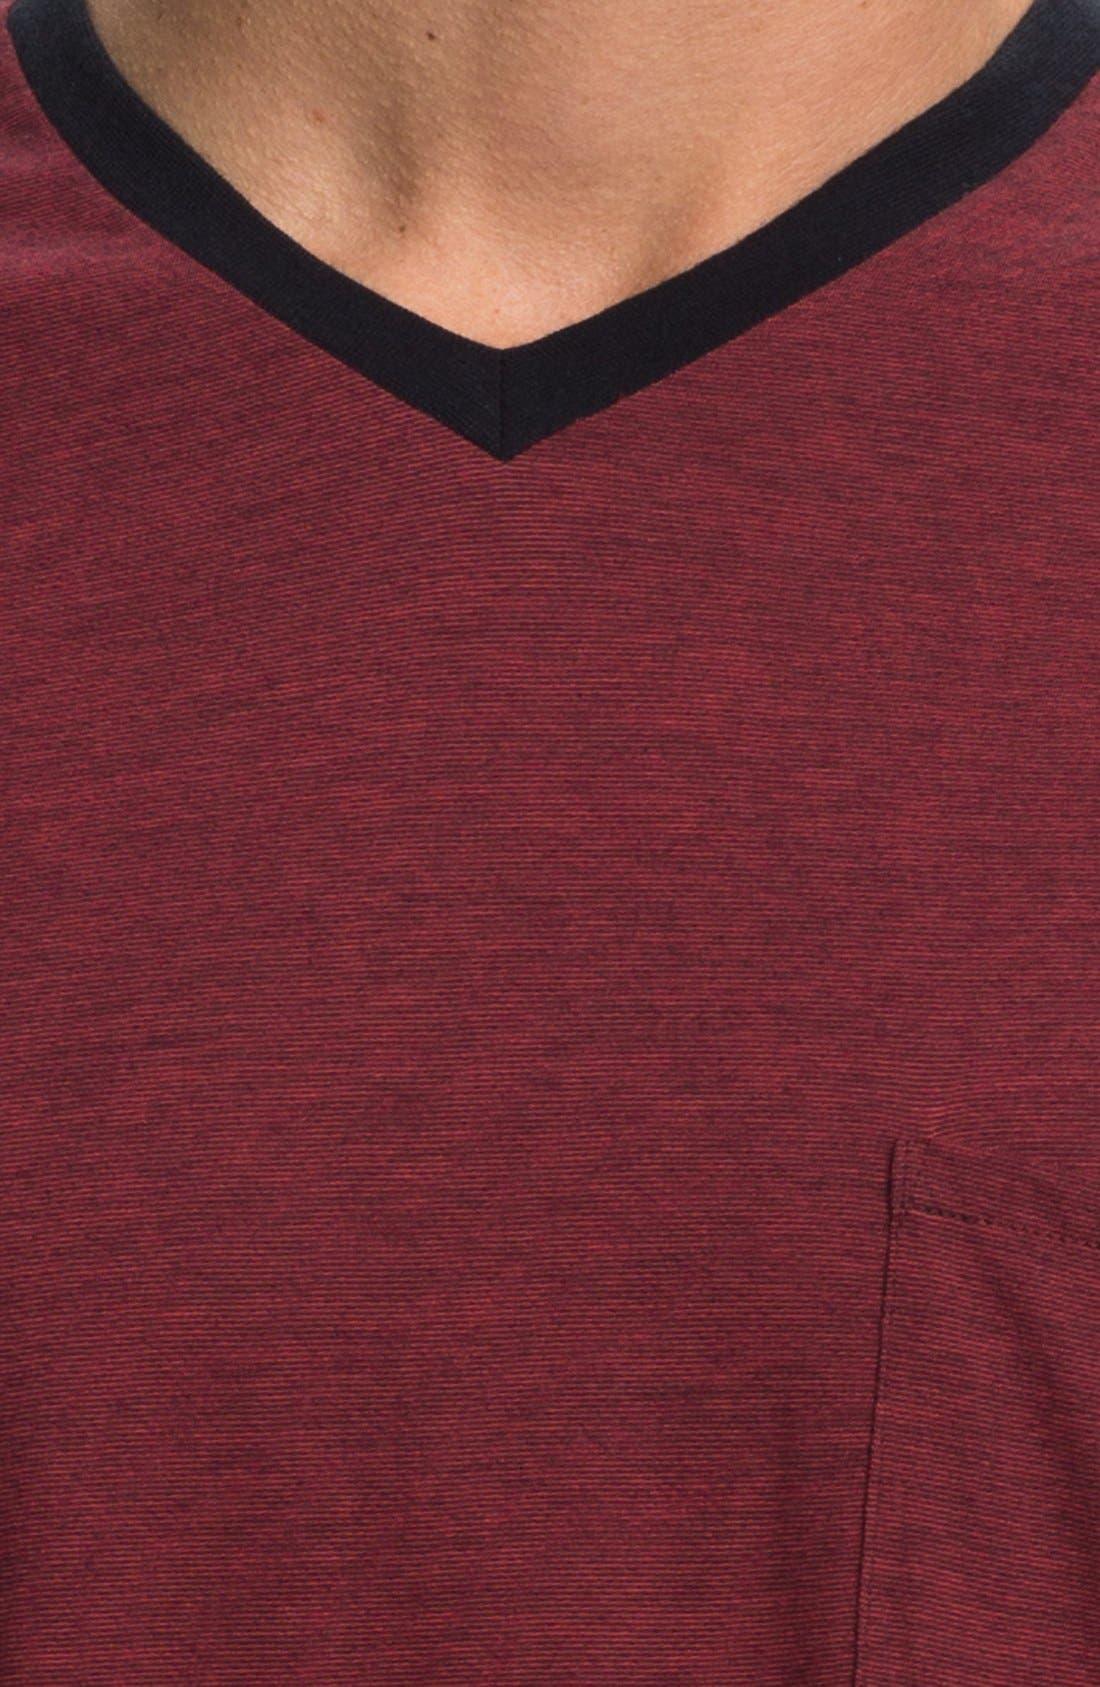 Alternate Image 3  - Daniel Buchler Pima Cotton & Modal V-Neck T-Shirt